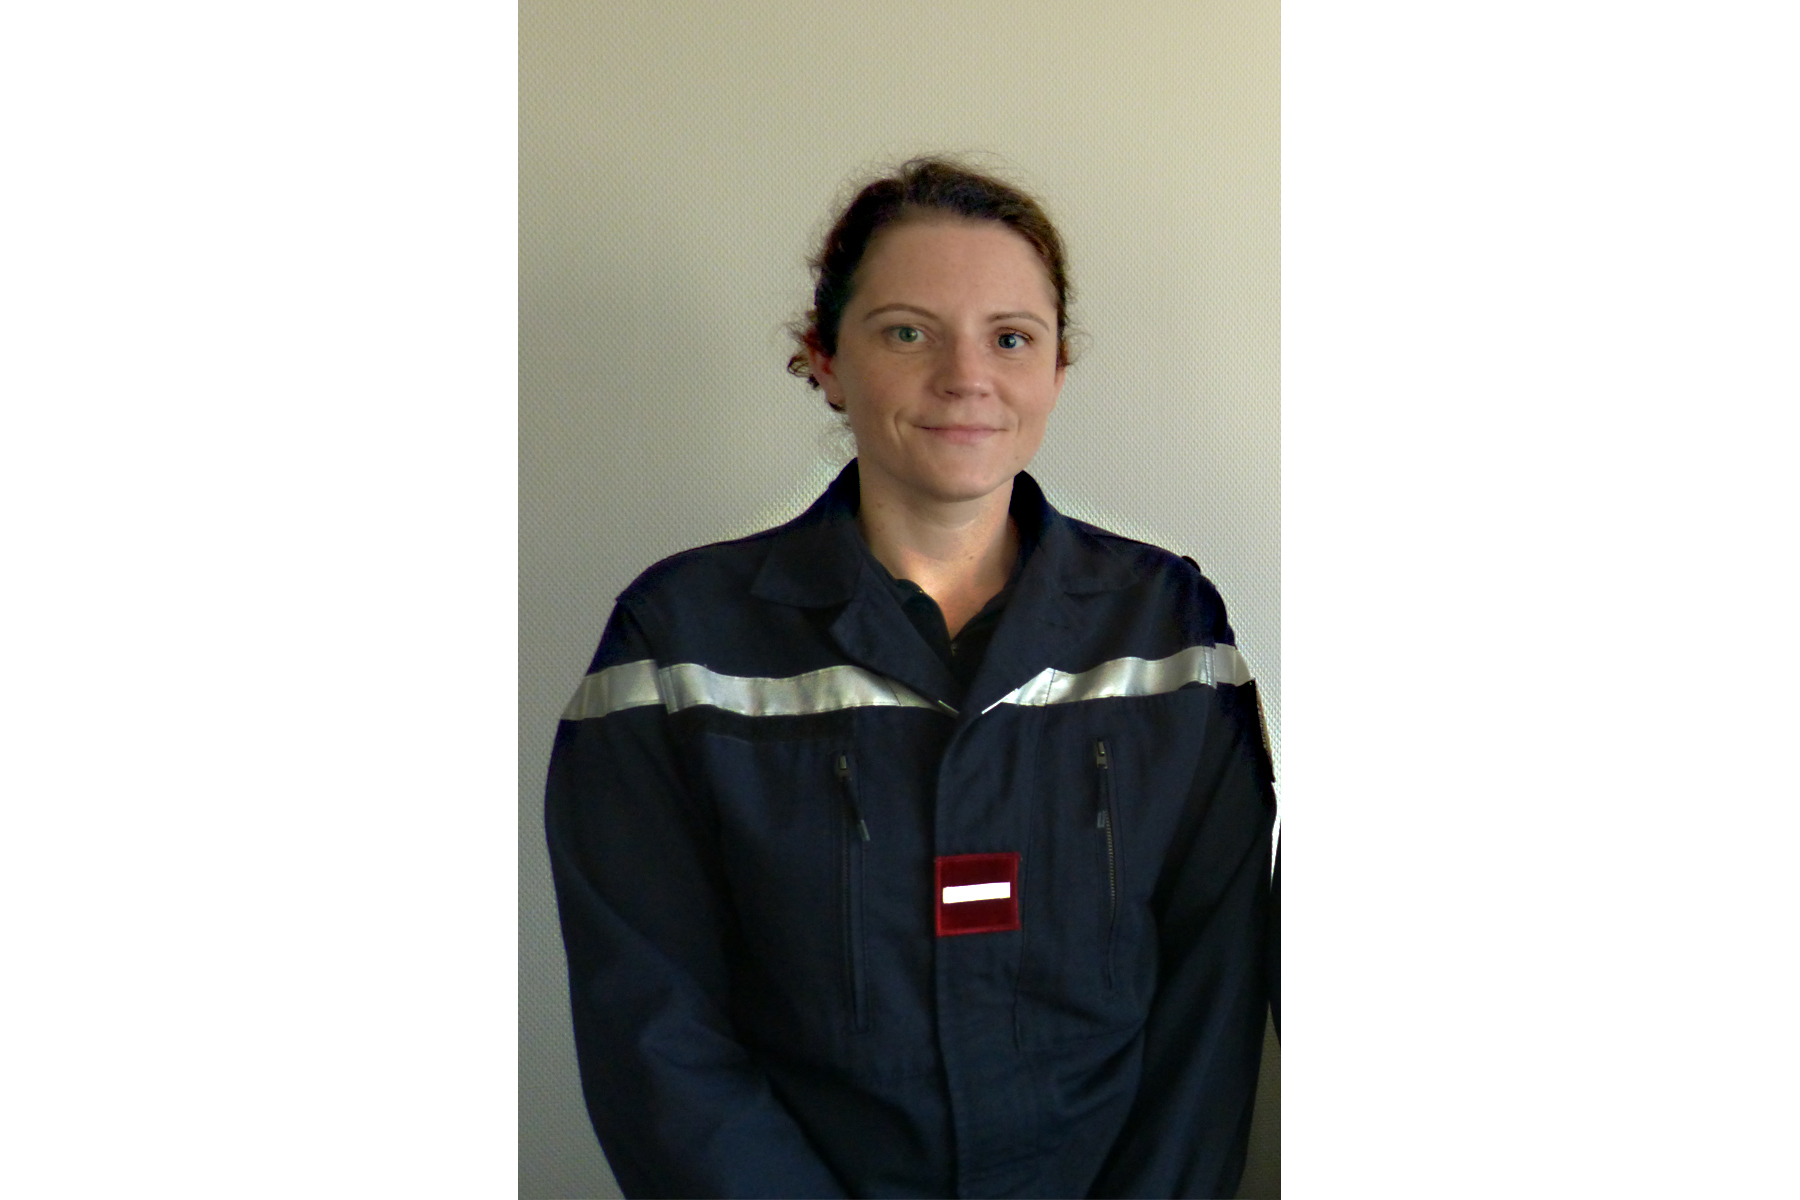 Une infirmière du SDIS du Tarn formatrice en Turquie